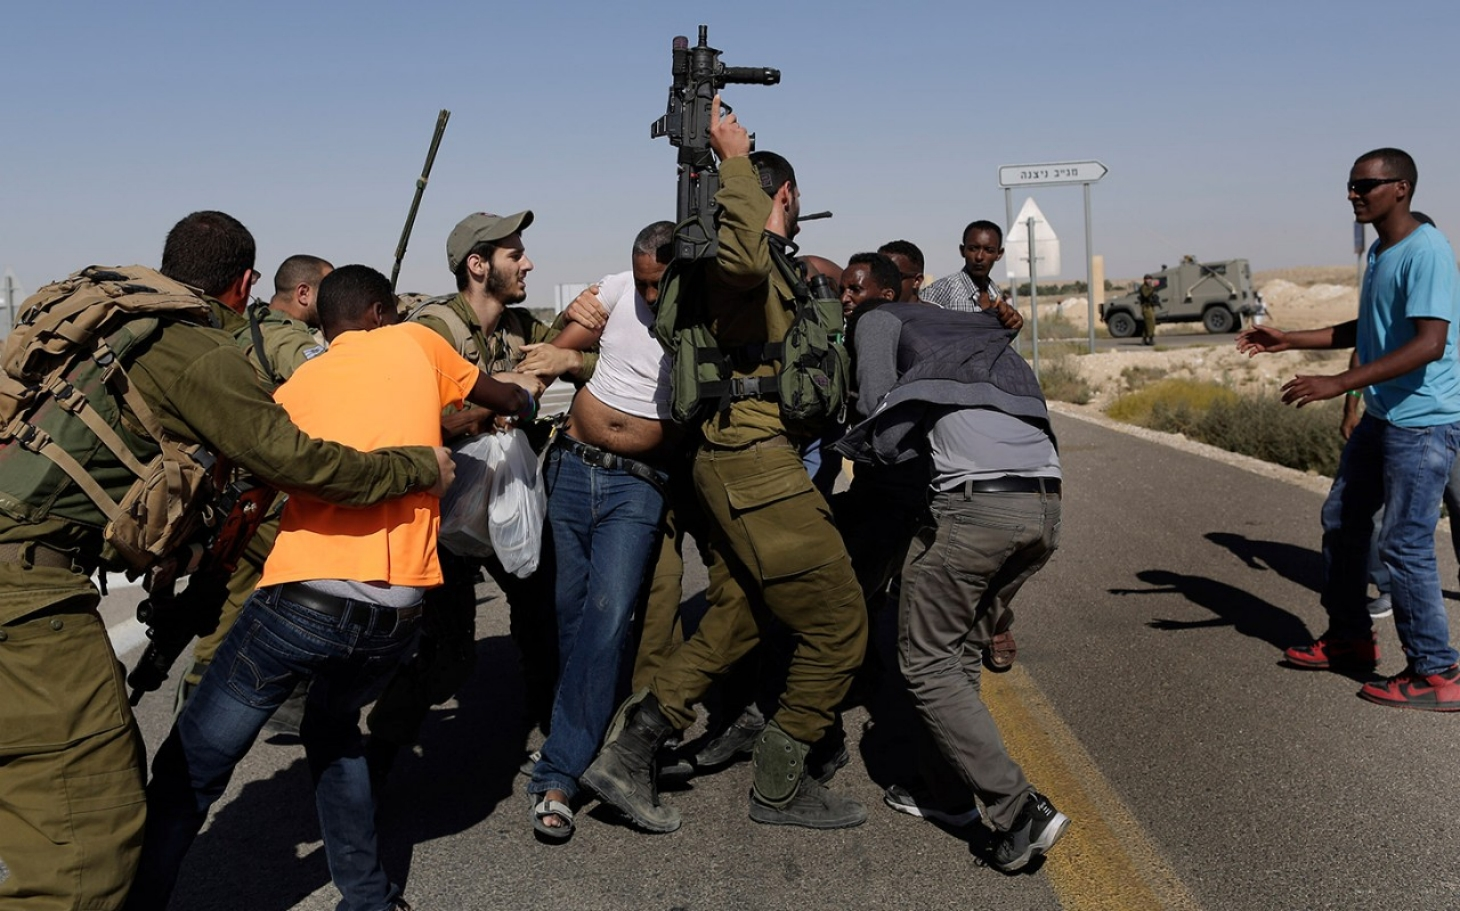 http://america.aljazeera.com/content/ajam/articles/2014/6/29/african-migrantsprotestisraelitreatment/jcr:content/headlineImage.adapt.1460.high.African-Migrant_protest.1404083301725.jpg